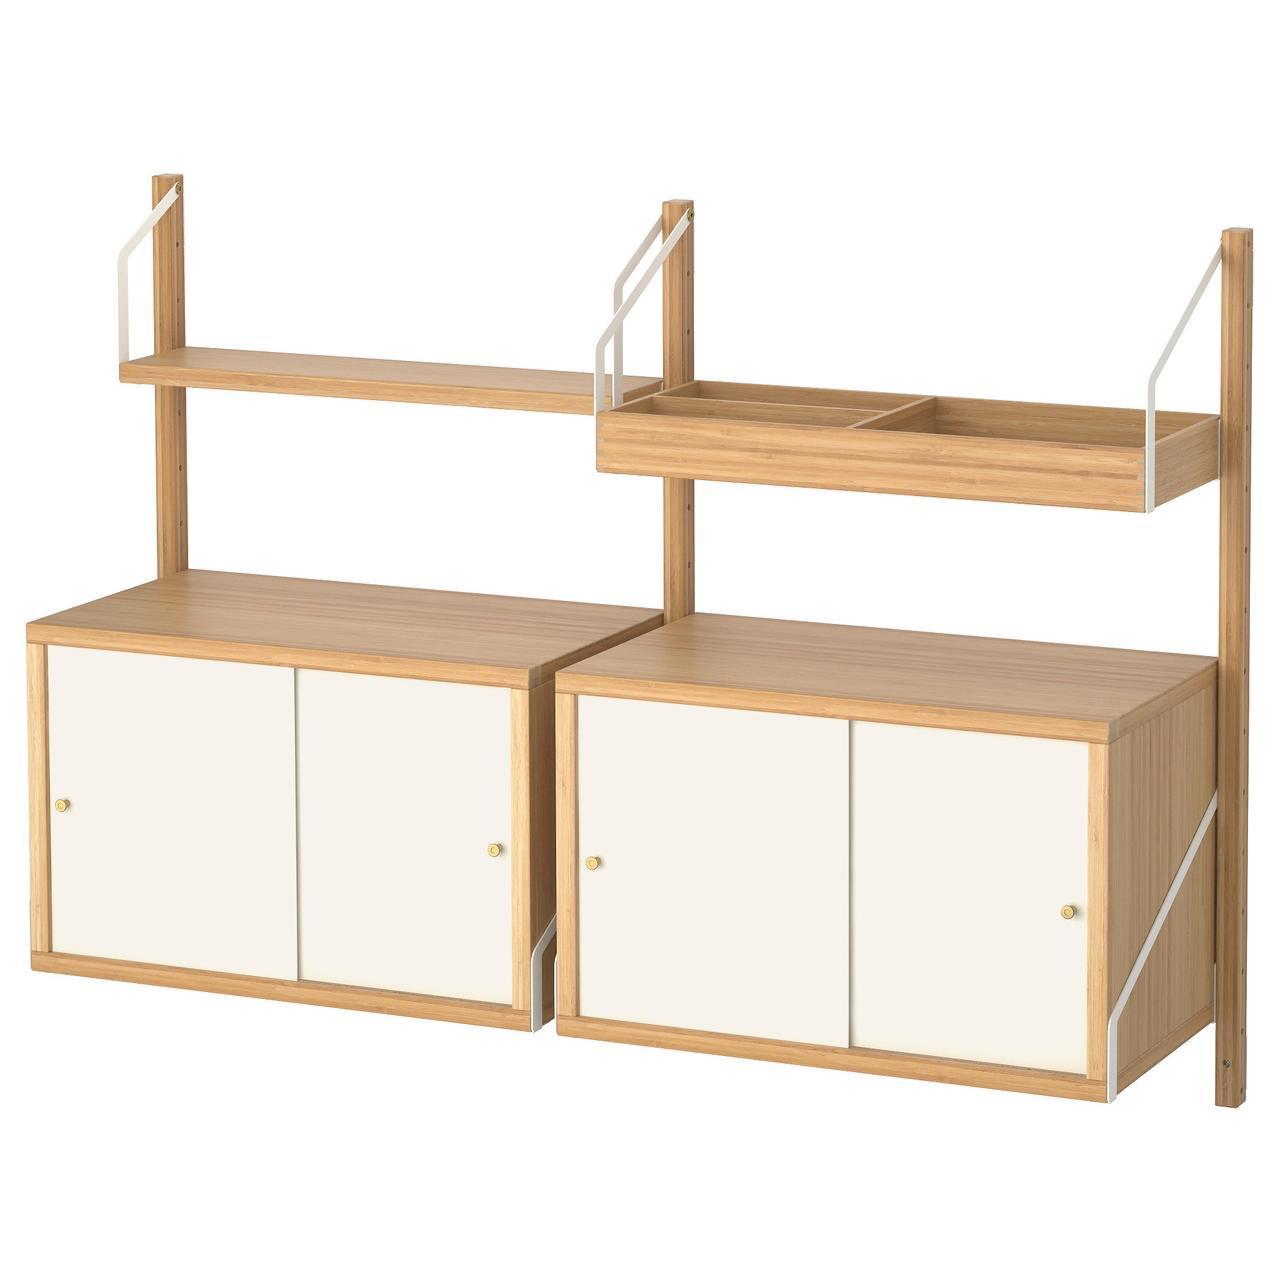 IKEA SVALNAS Настенный стеллаж, бамбук, белый  (491.844.65)